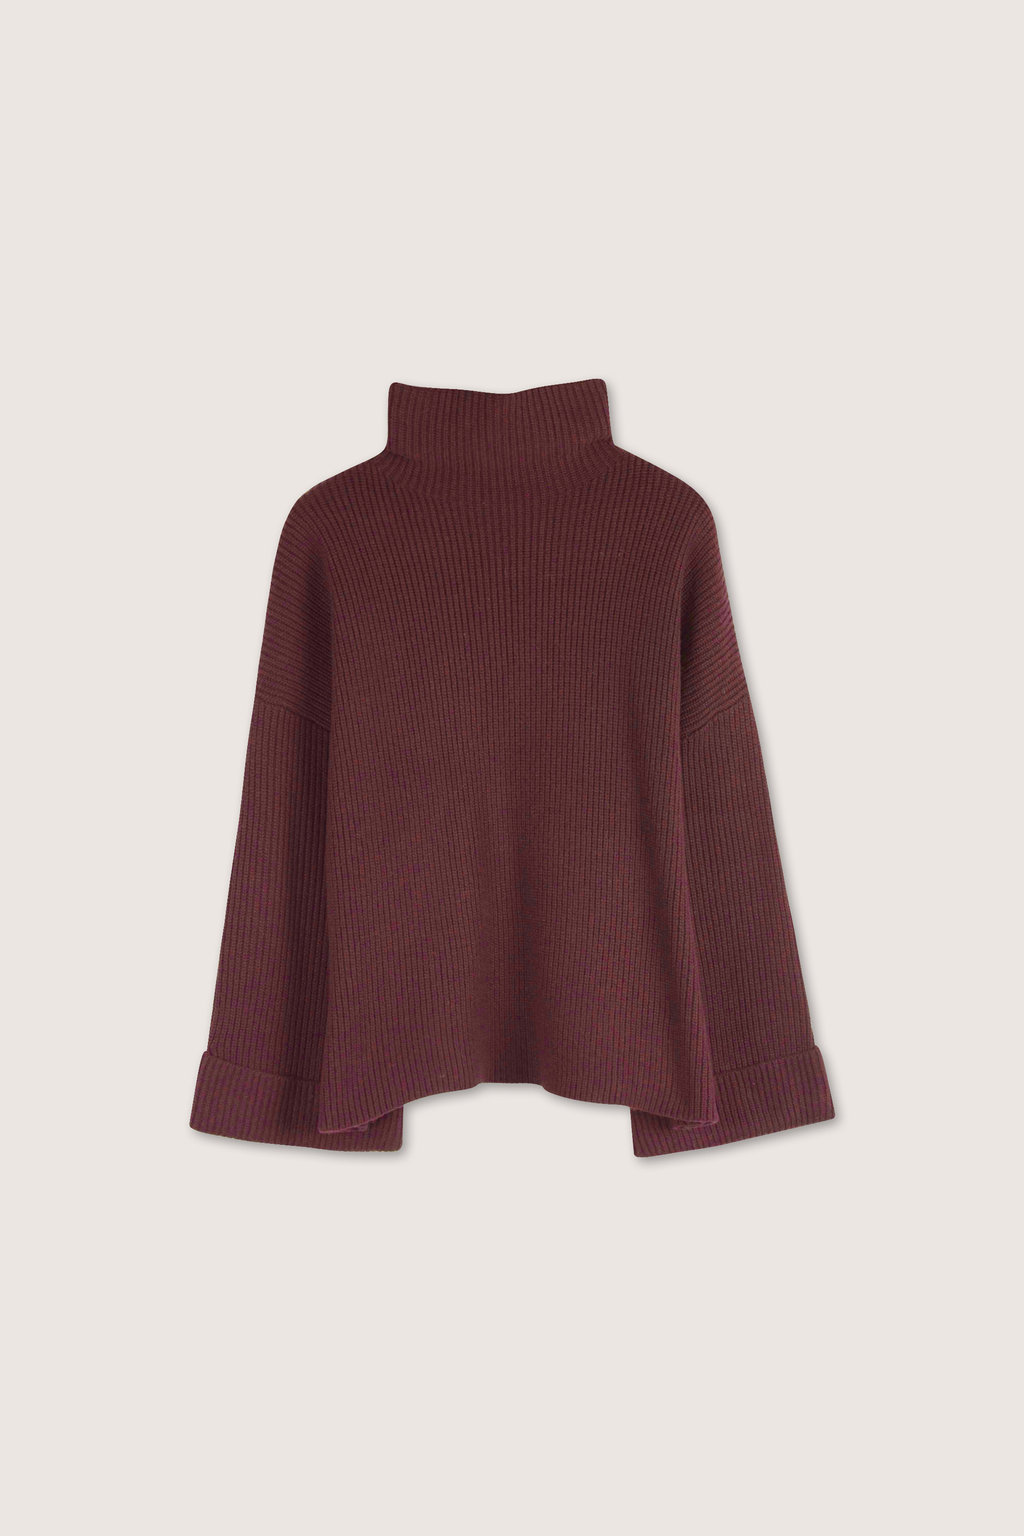 Sweater 1828 Burgundy 11